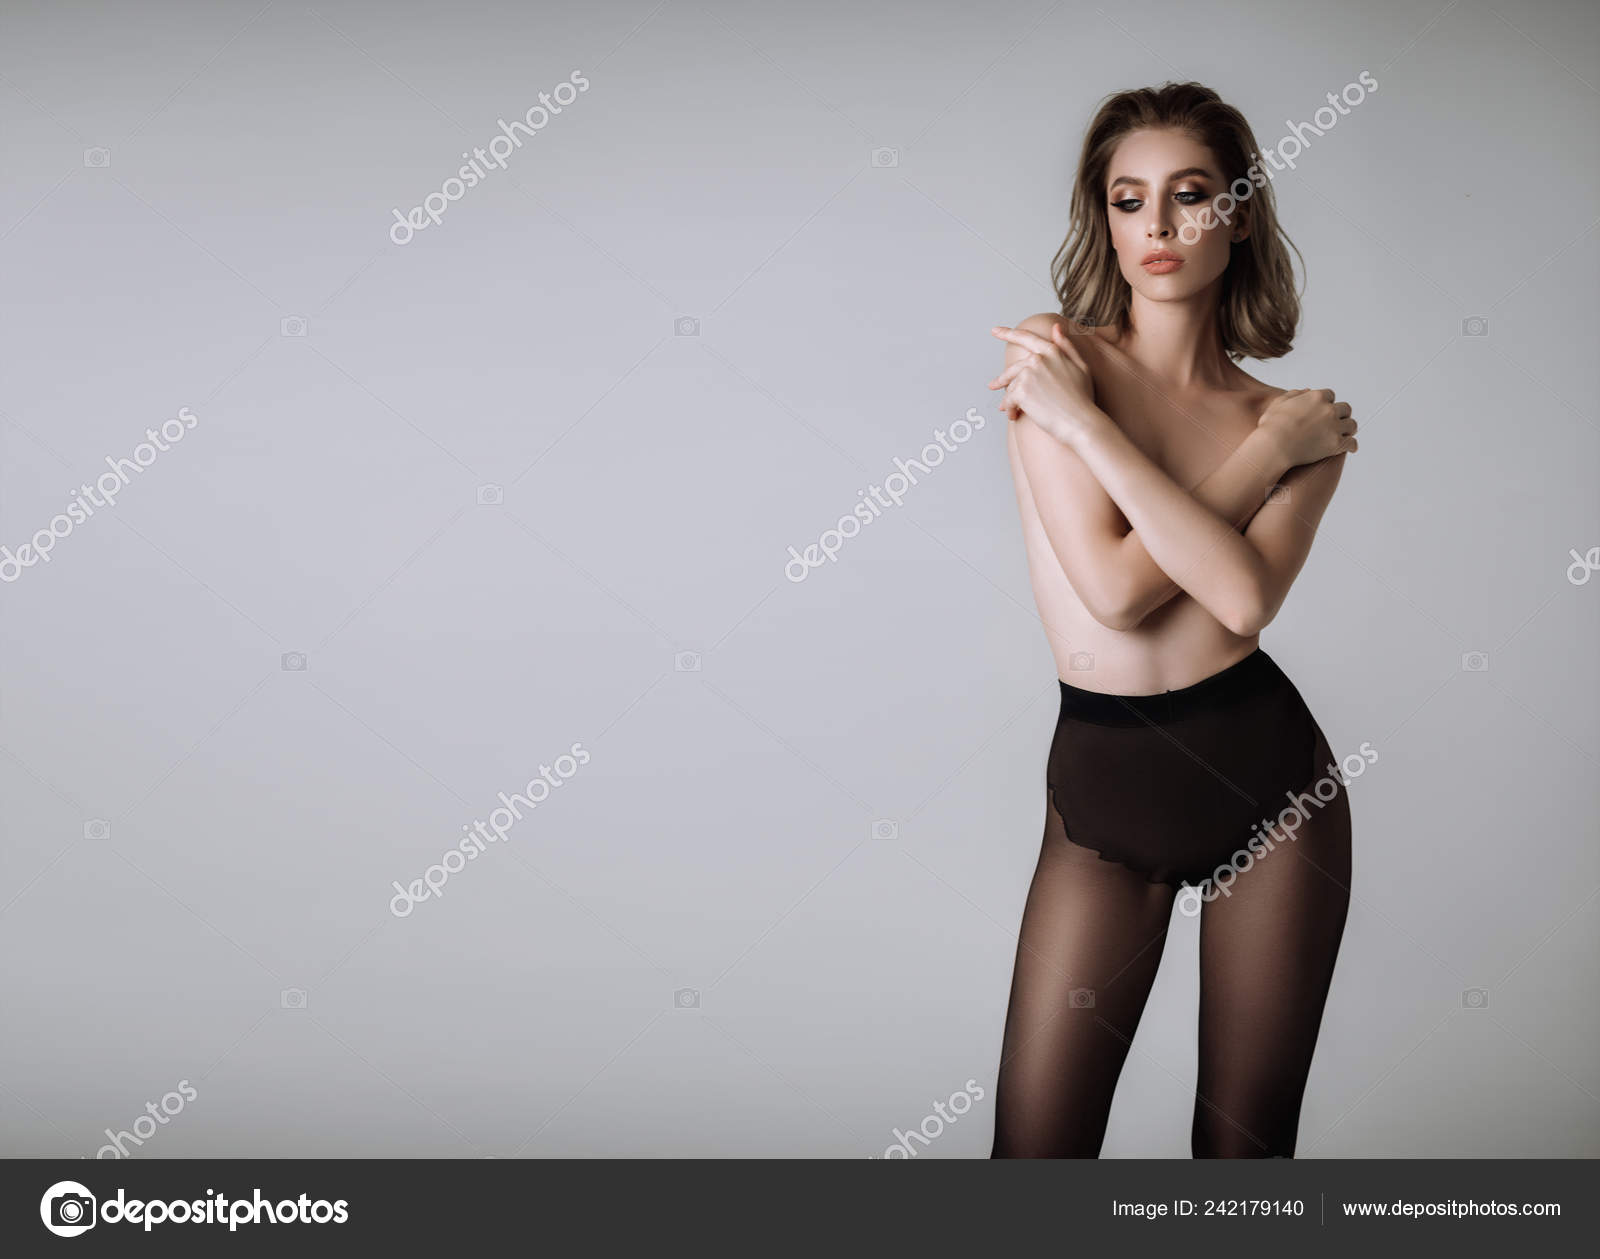 www γυμνό κορίτσι φωτογραφίες com